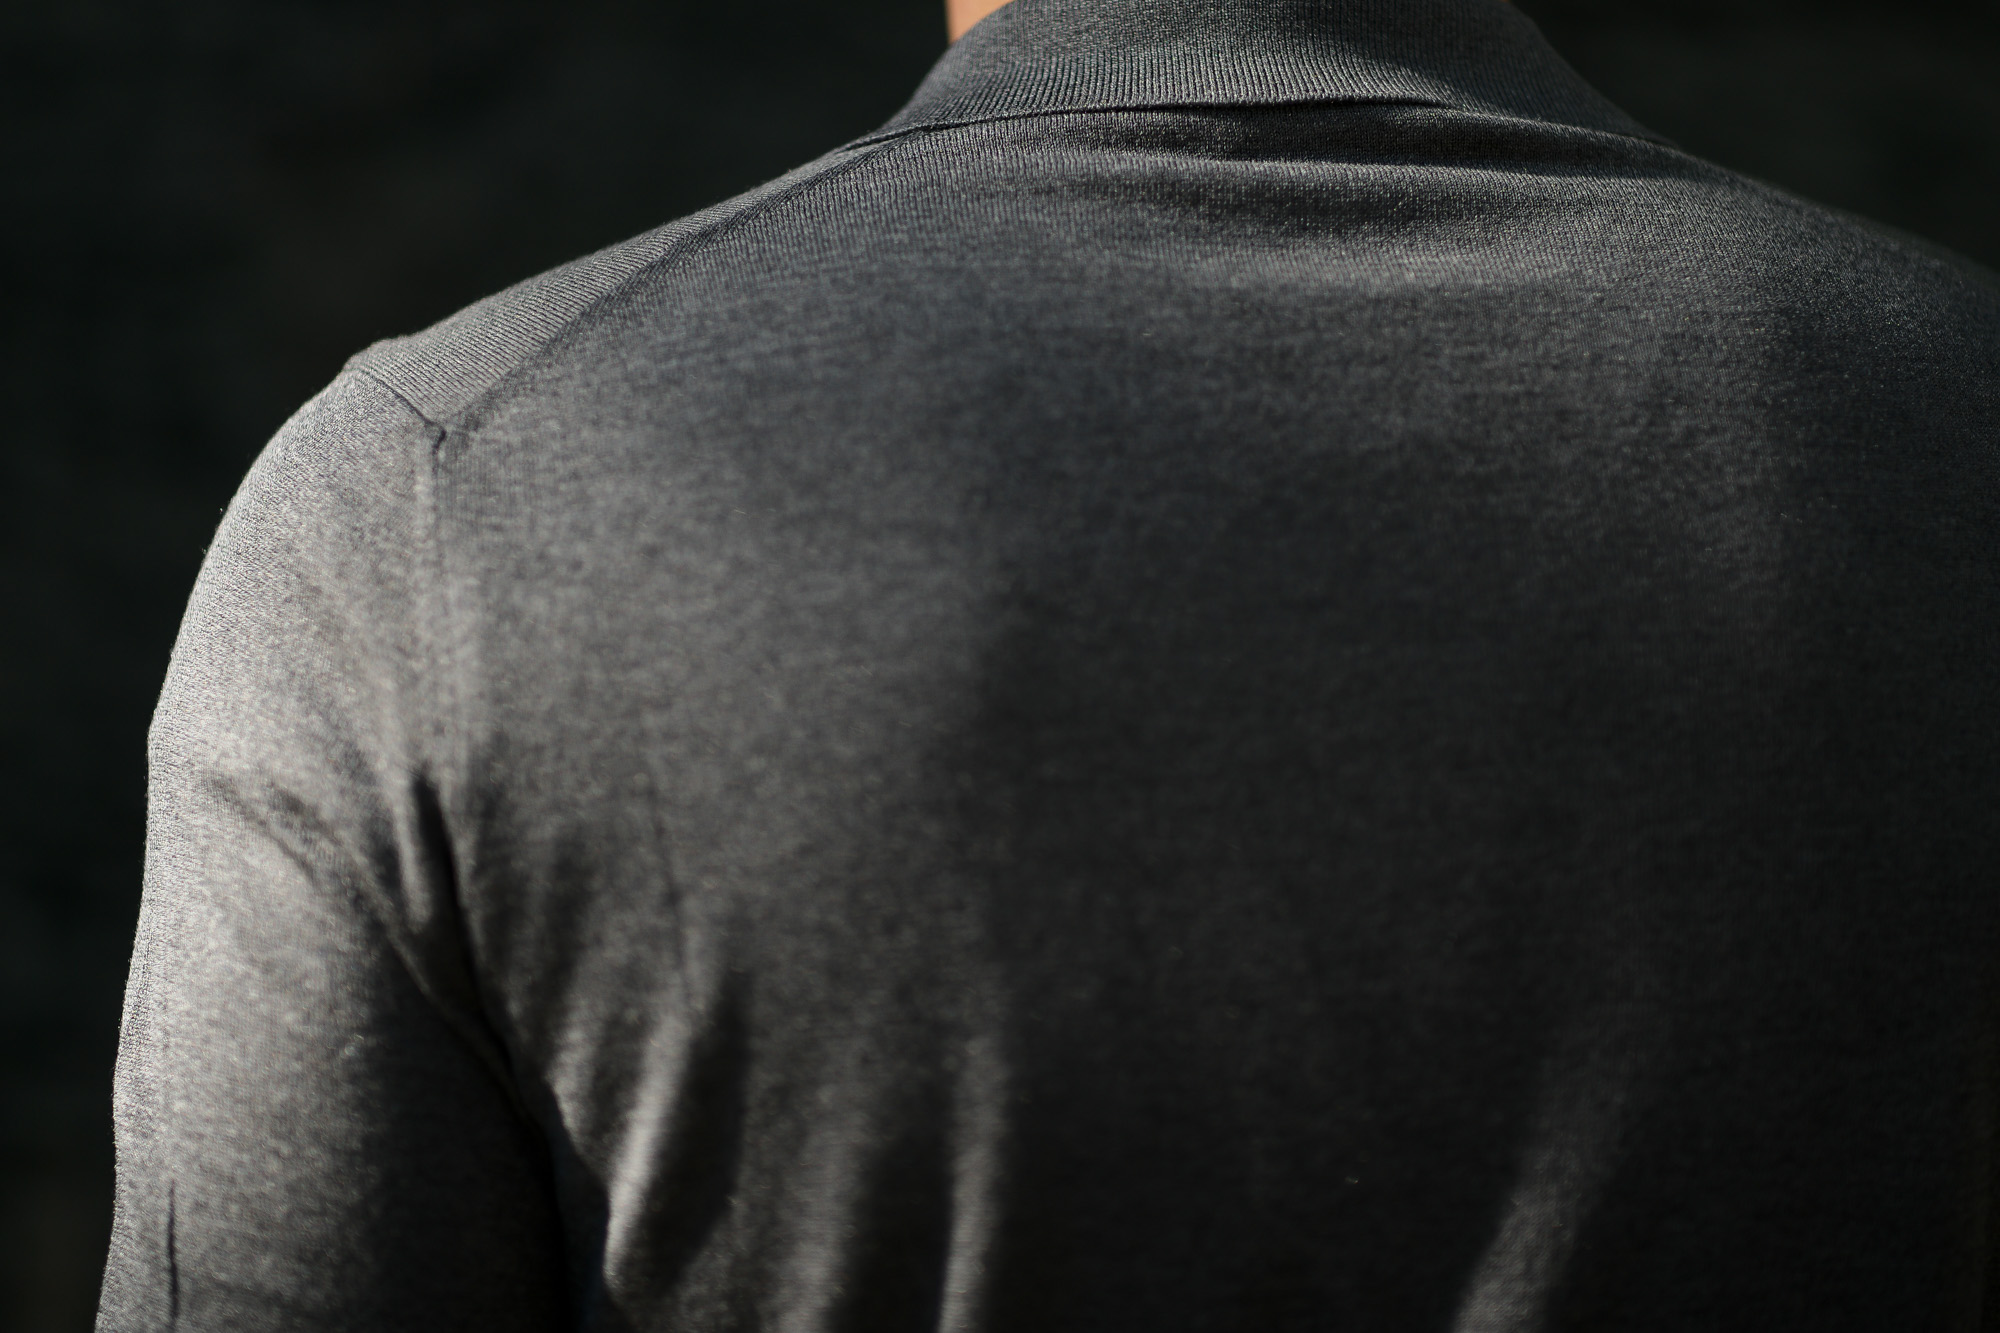 Gran Sasso (グランサッソ) Silk Knit Polo Shirt (シルクニットポロシャツ) SETA (シルク 100%) シルク ニット ポロシャツ GREY (グレー・097) made in italy (イタリア製) 2020 春夏新作 愛知 名古屋 altoediritto アルトエデリット